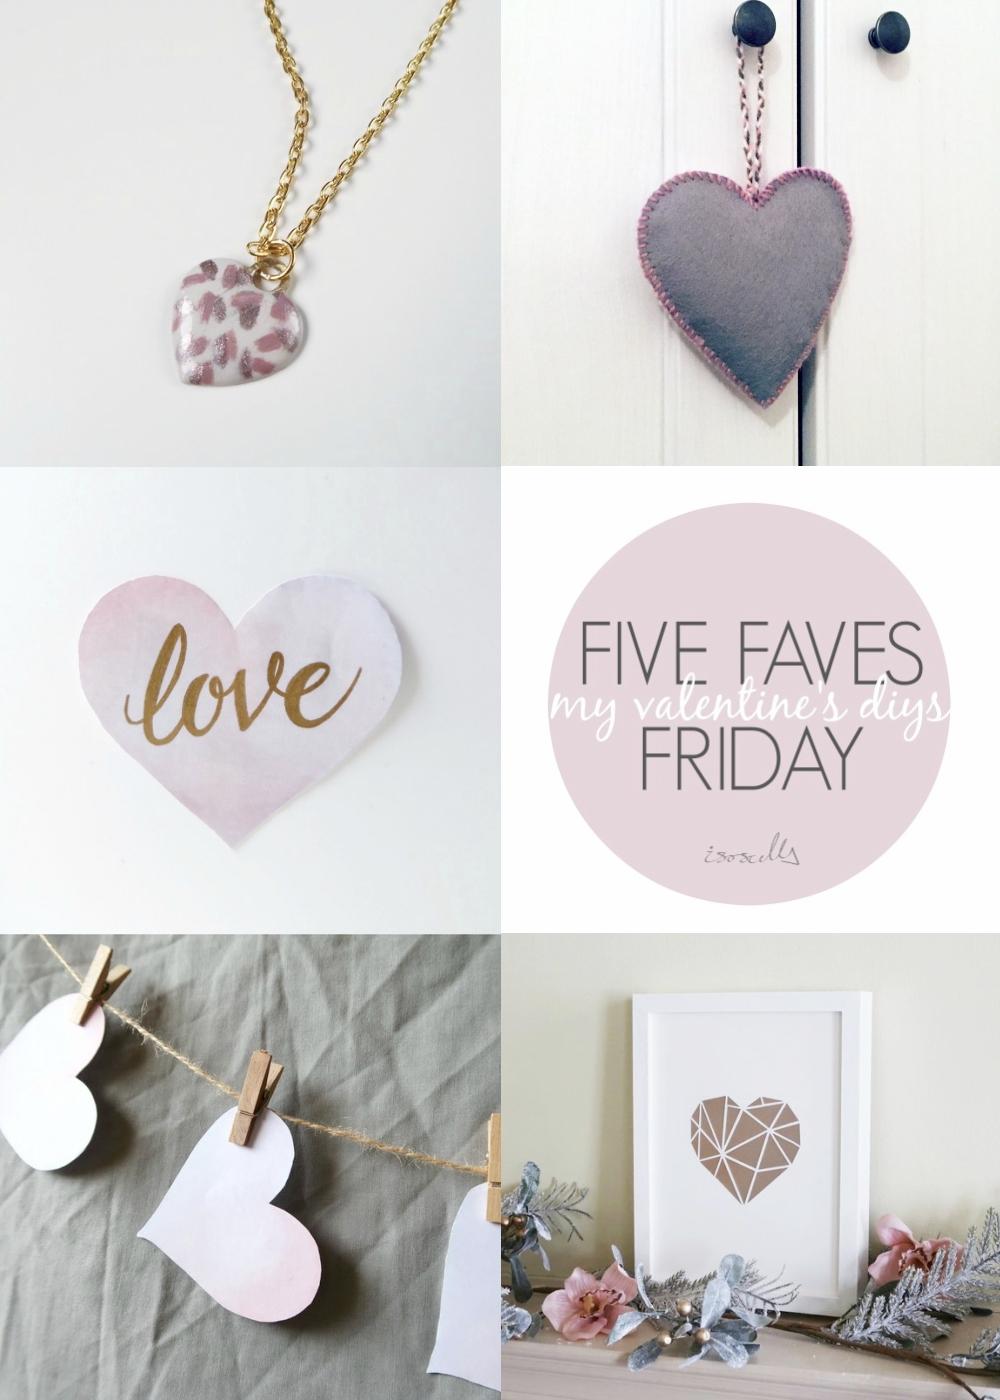 Five Faves Friday - My Valentine's DIYs - Isoscella